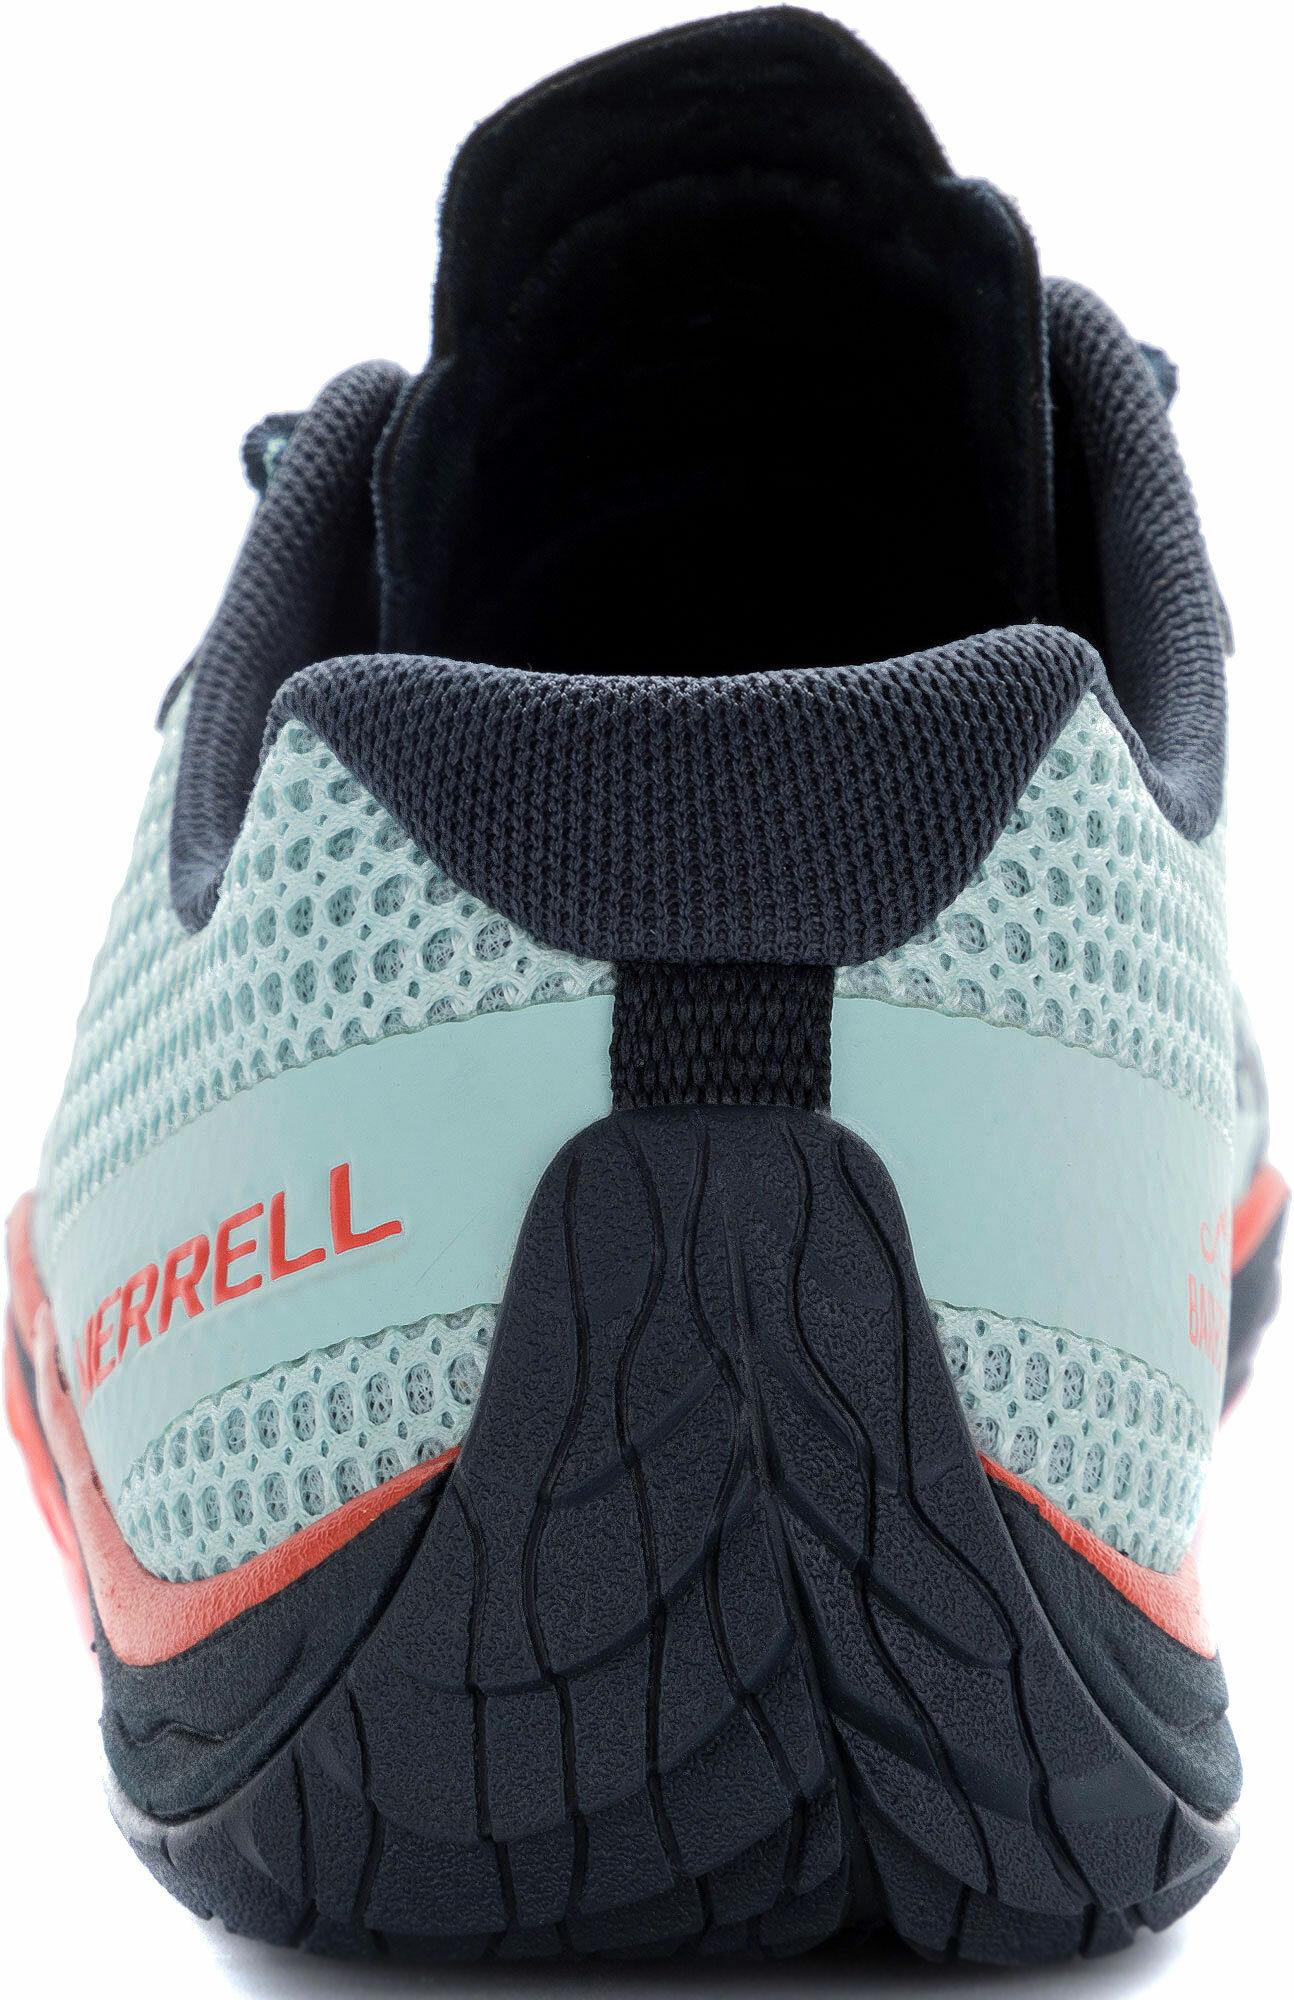 0b552604 ... Кроссовки женские Merrell Trail Glove 5, размер 36 фото 3 ...